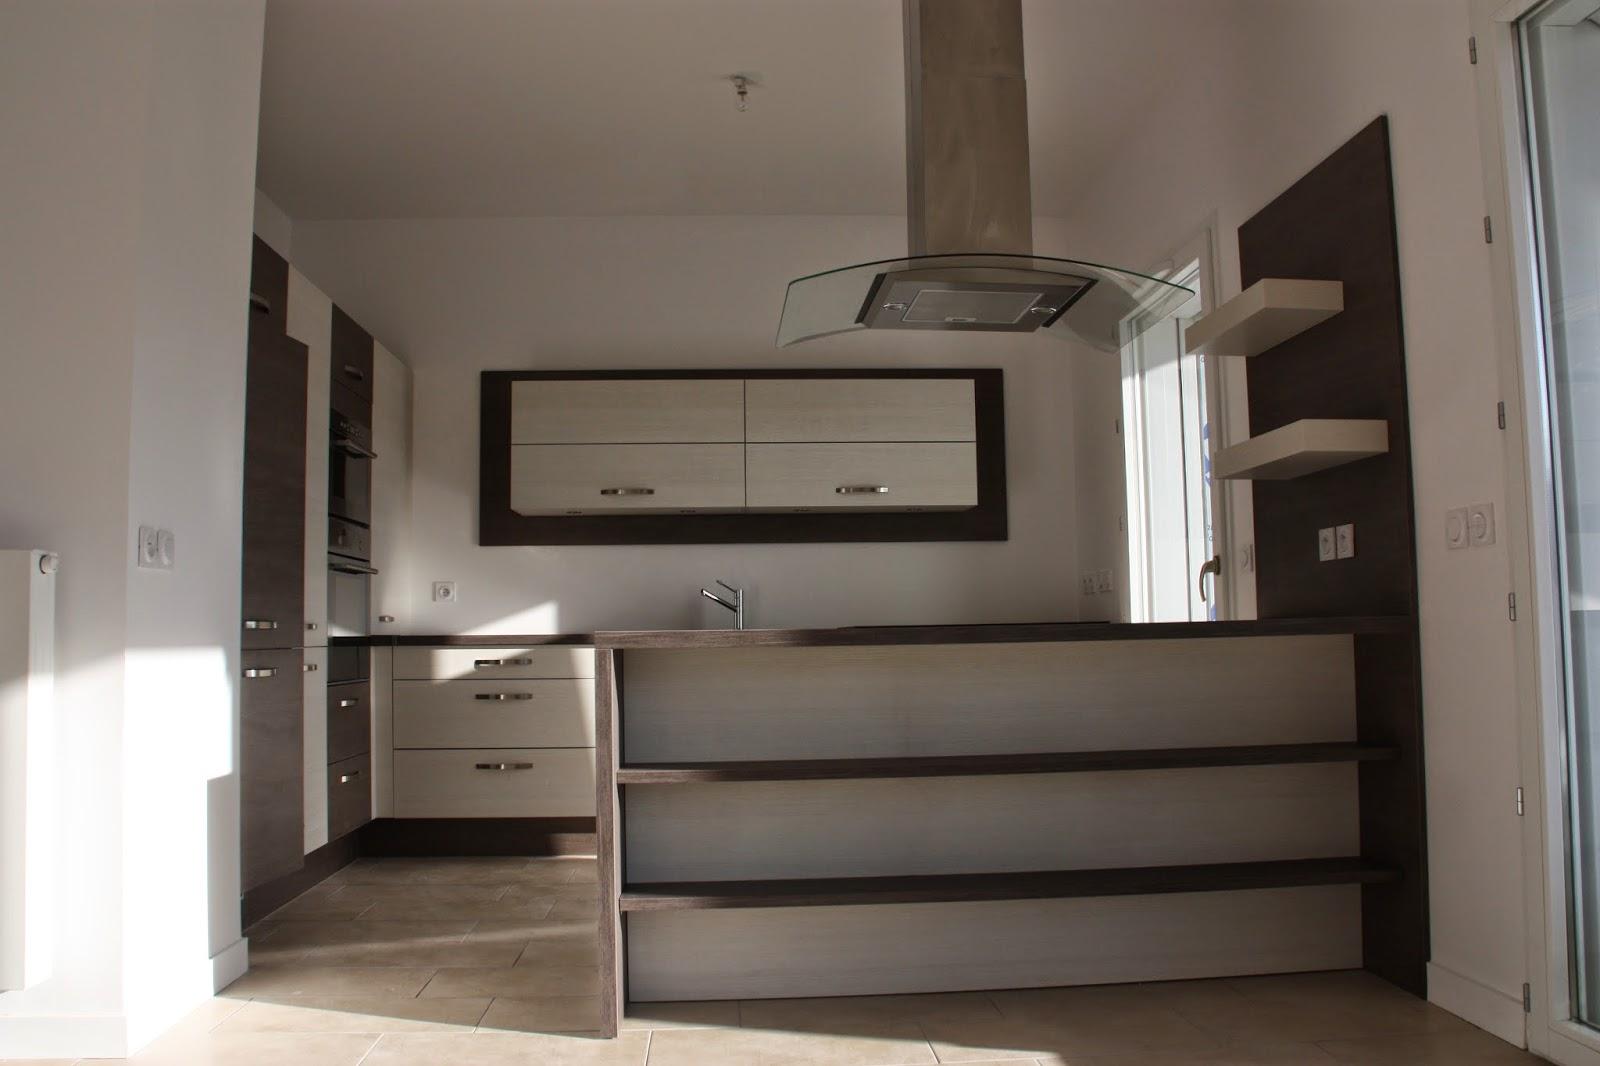 votre cuisine mobalpa par virginie mars 2015. Black Bedroom Furniture Sets. Home Design Ideas